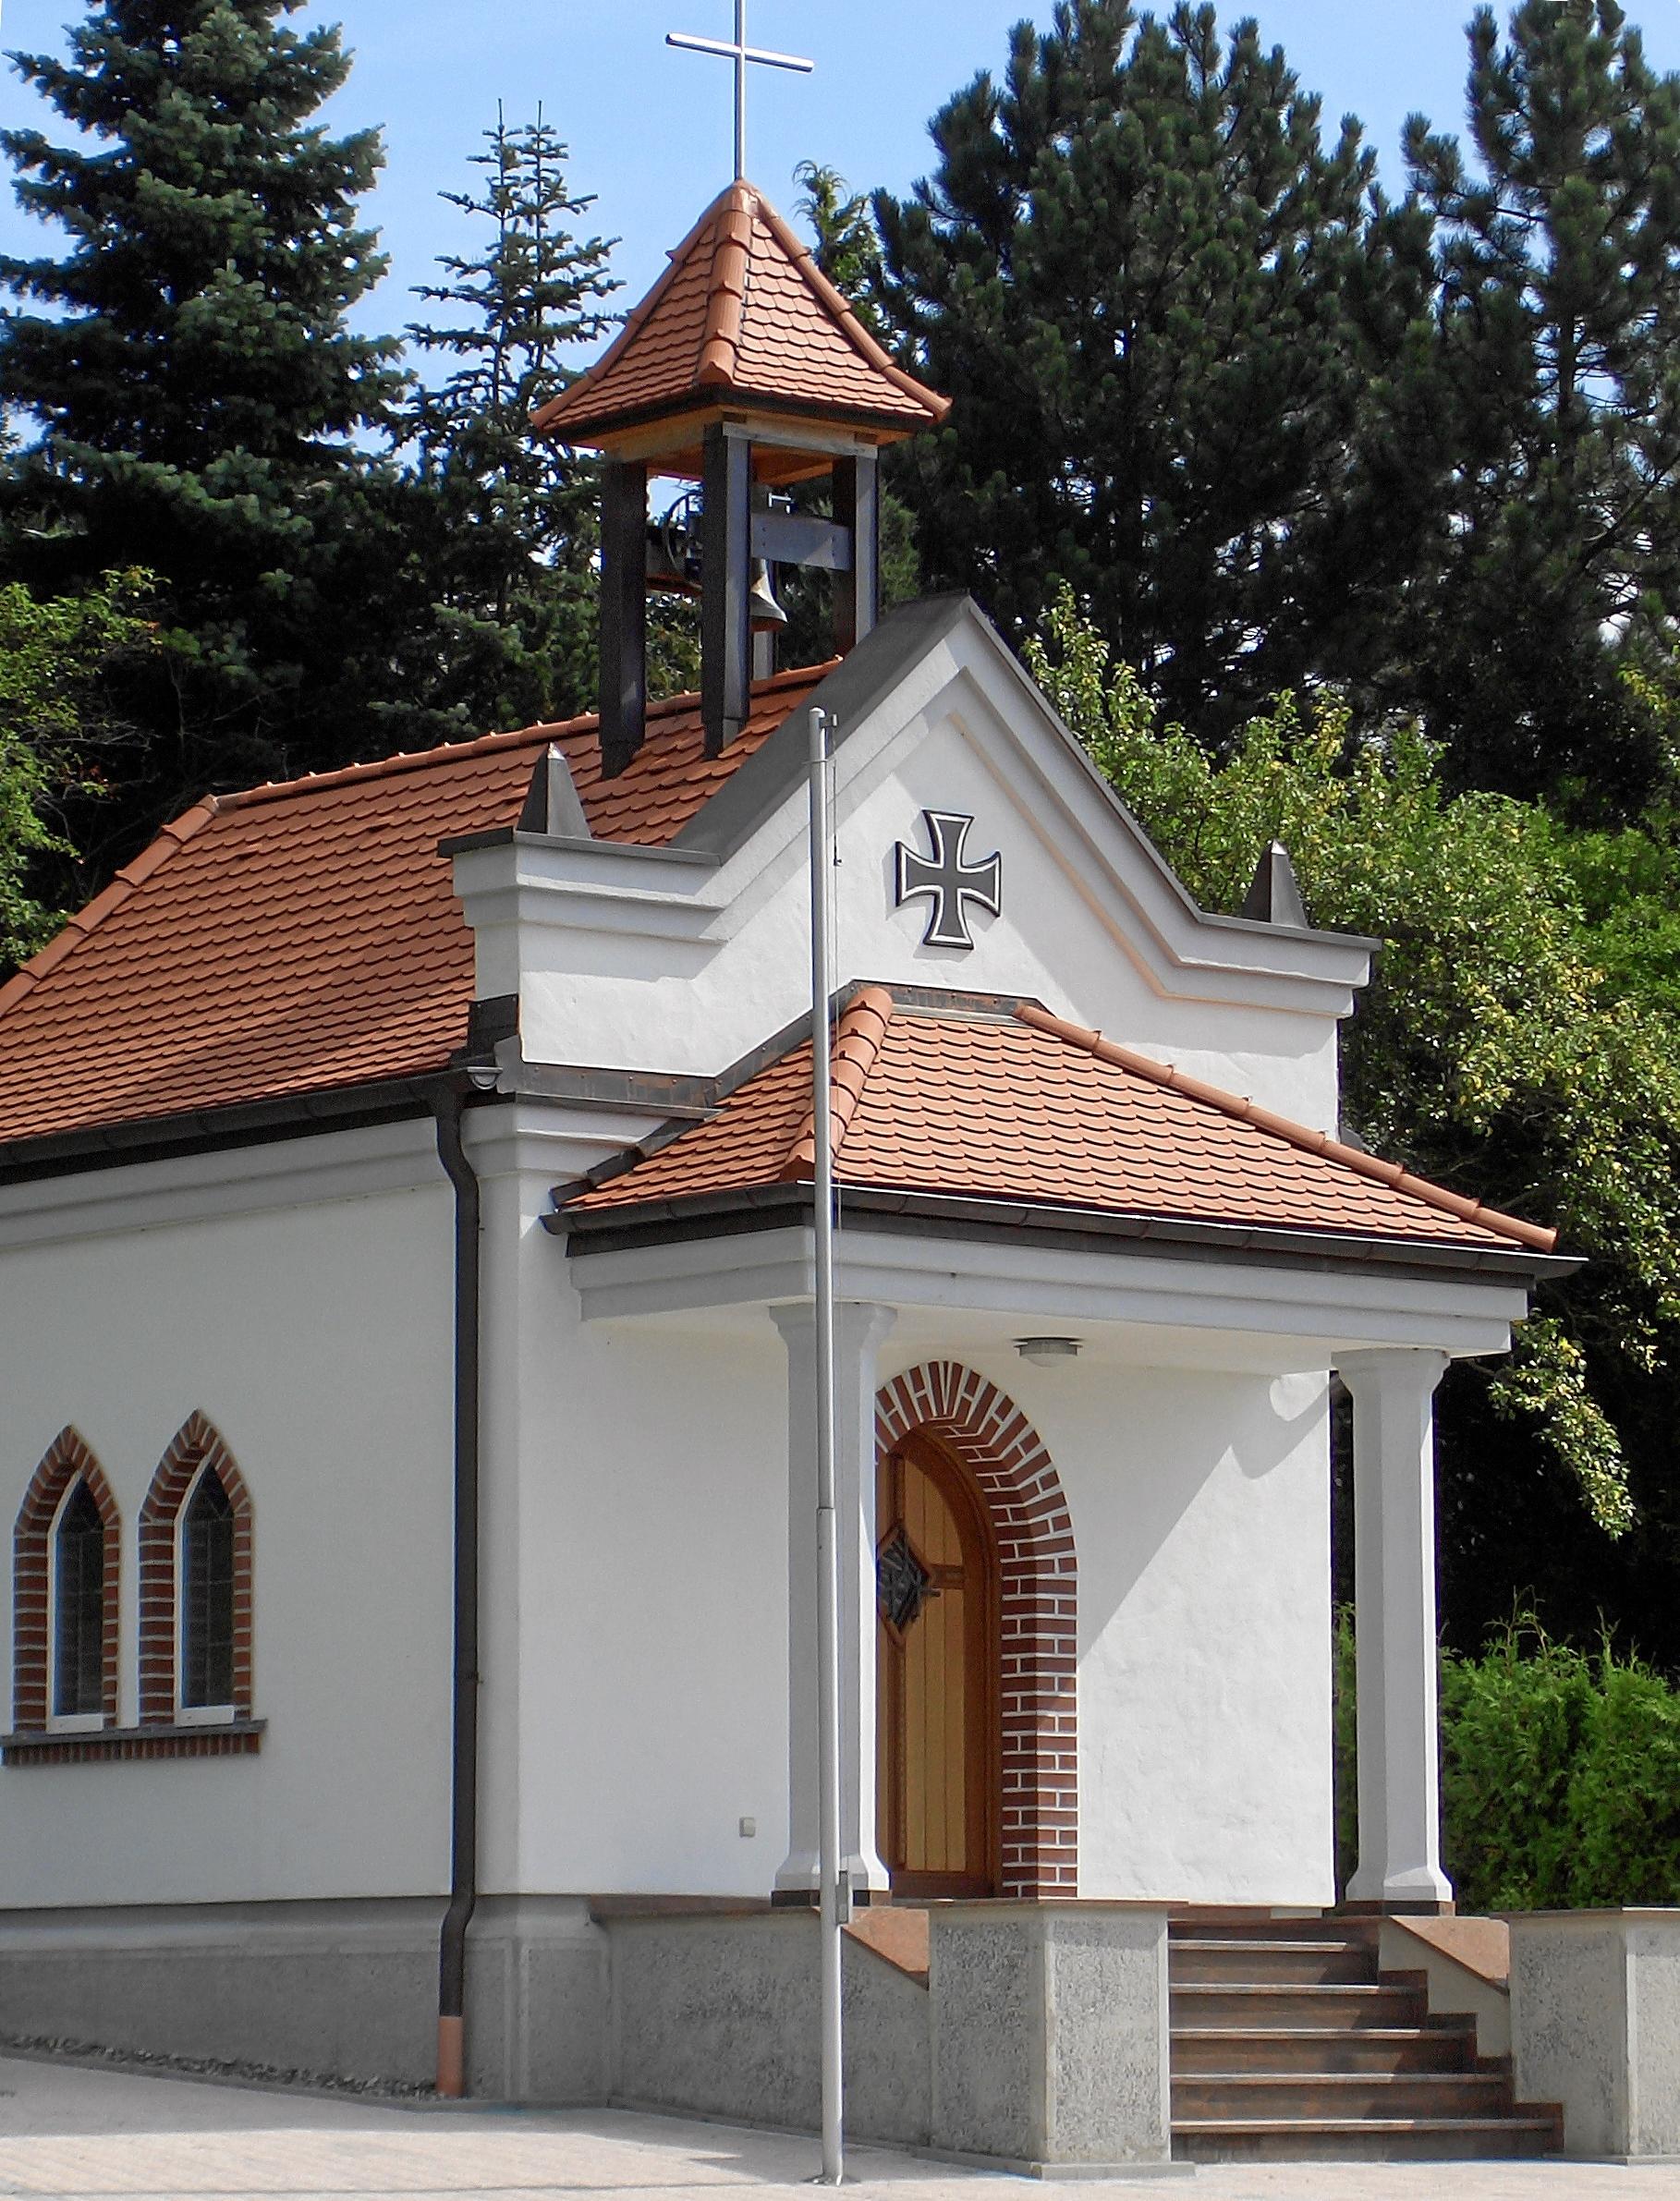 Kapelle in Zaubach